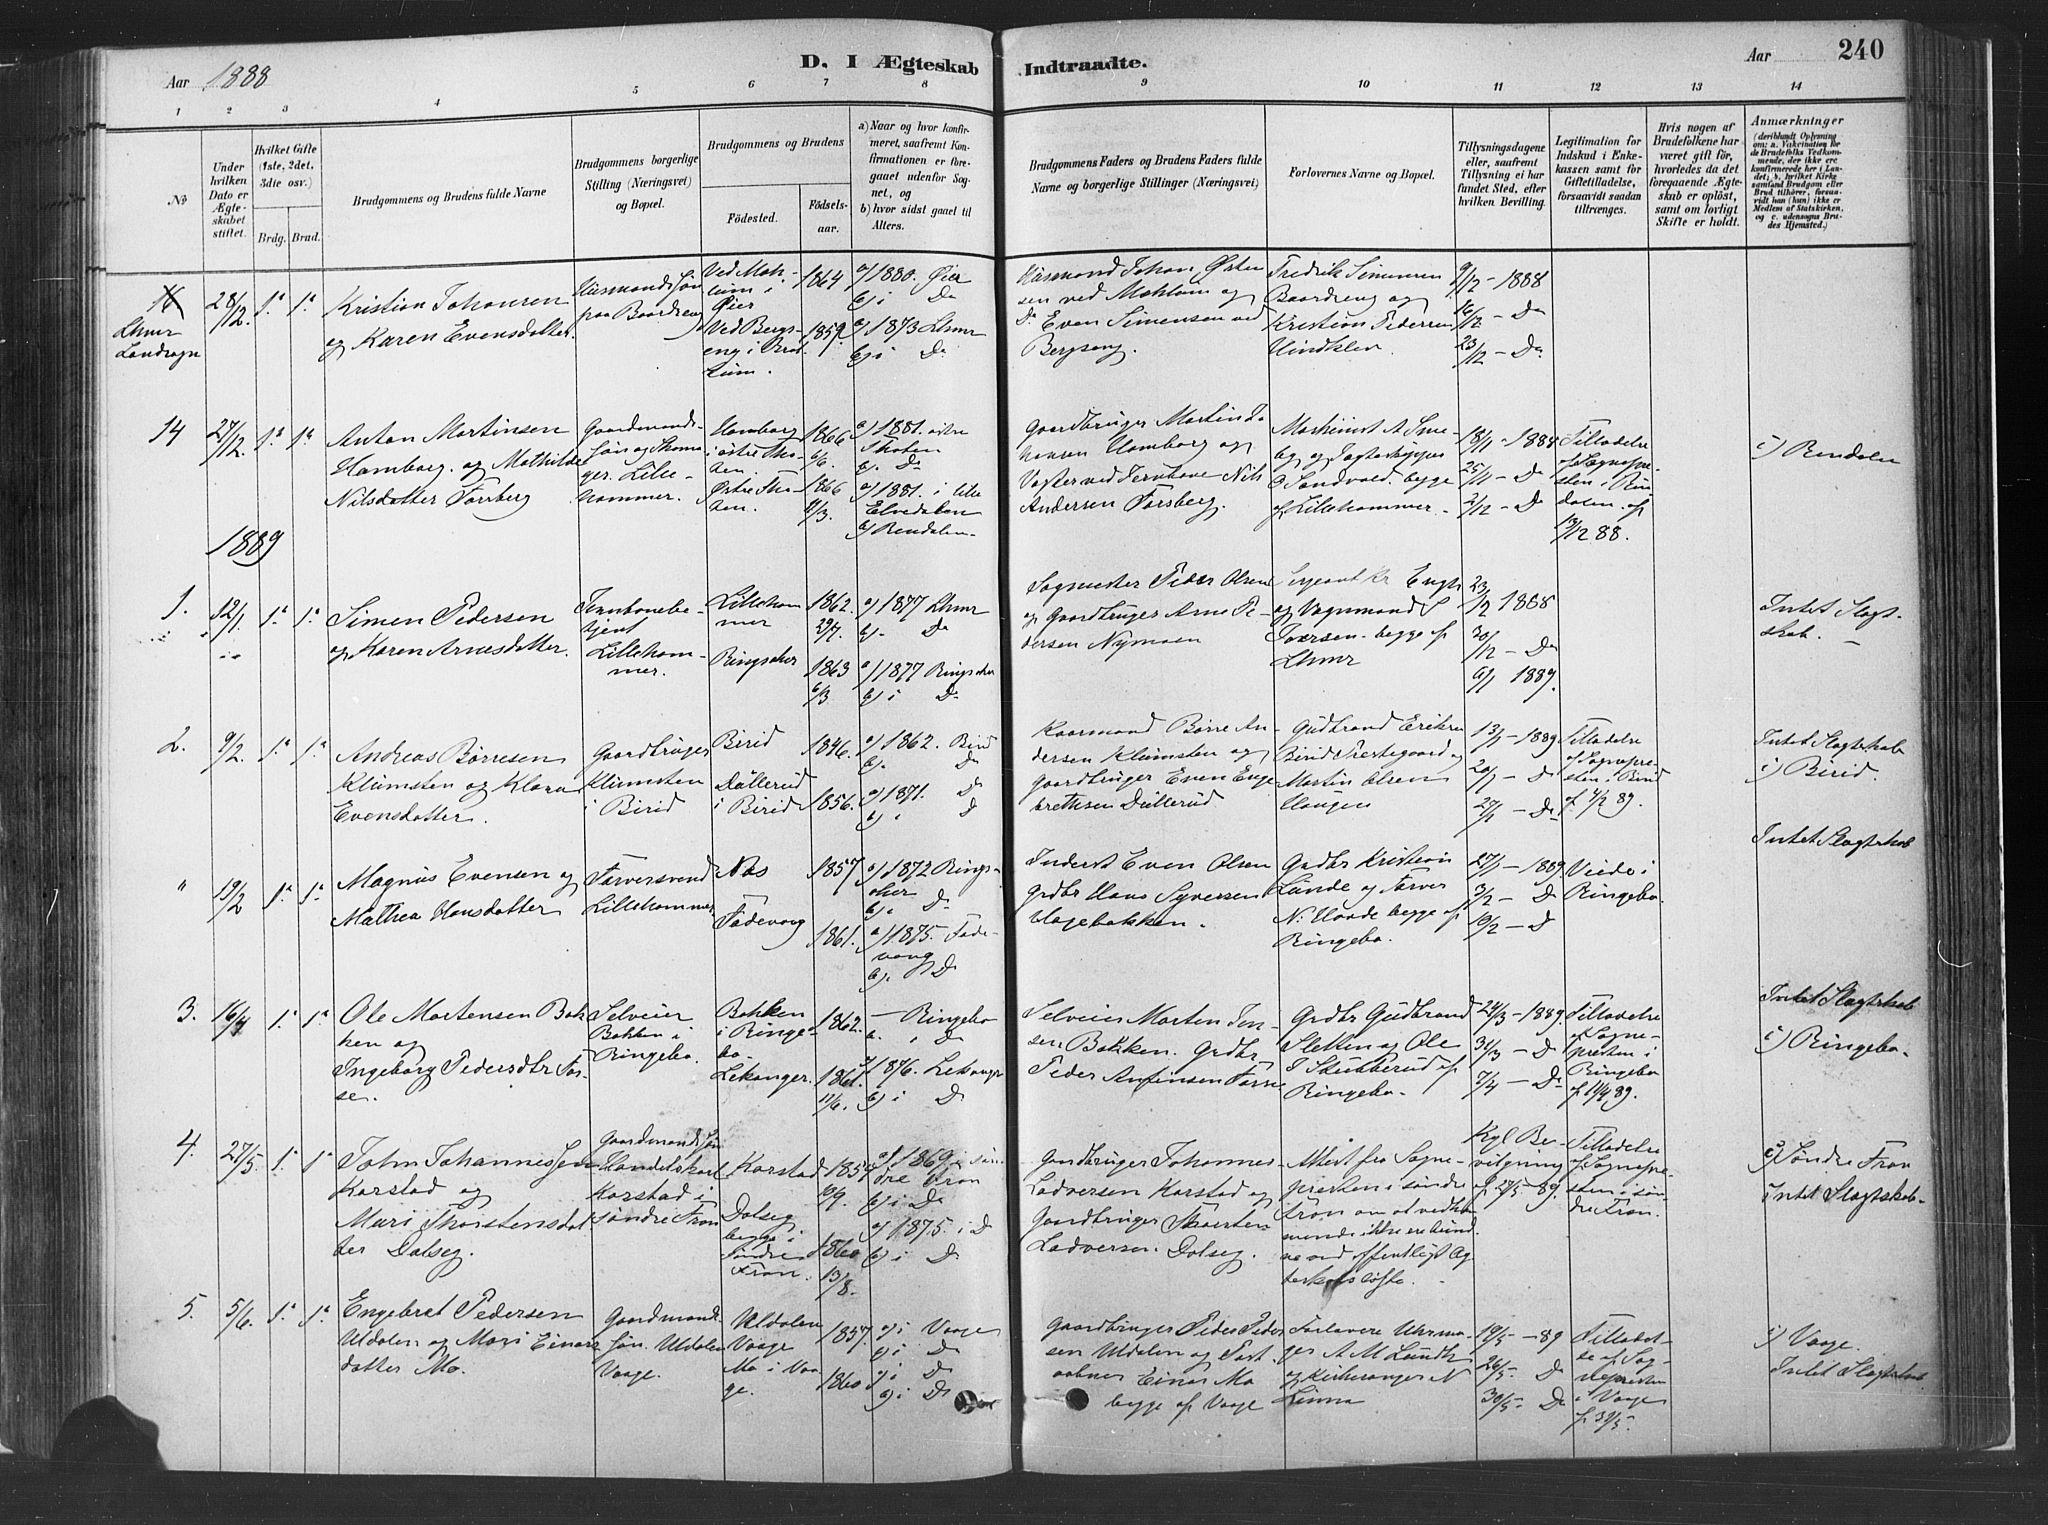 SAH, Fåberg prestekontor, Ministerialbok nr. 10, 1879-1900, s. 240